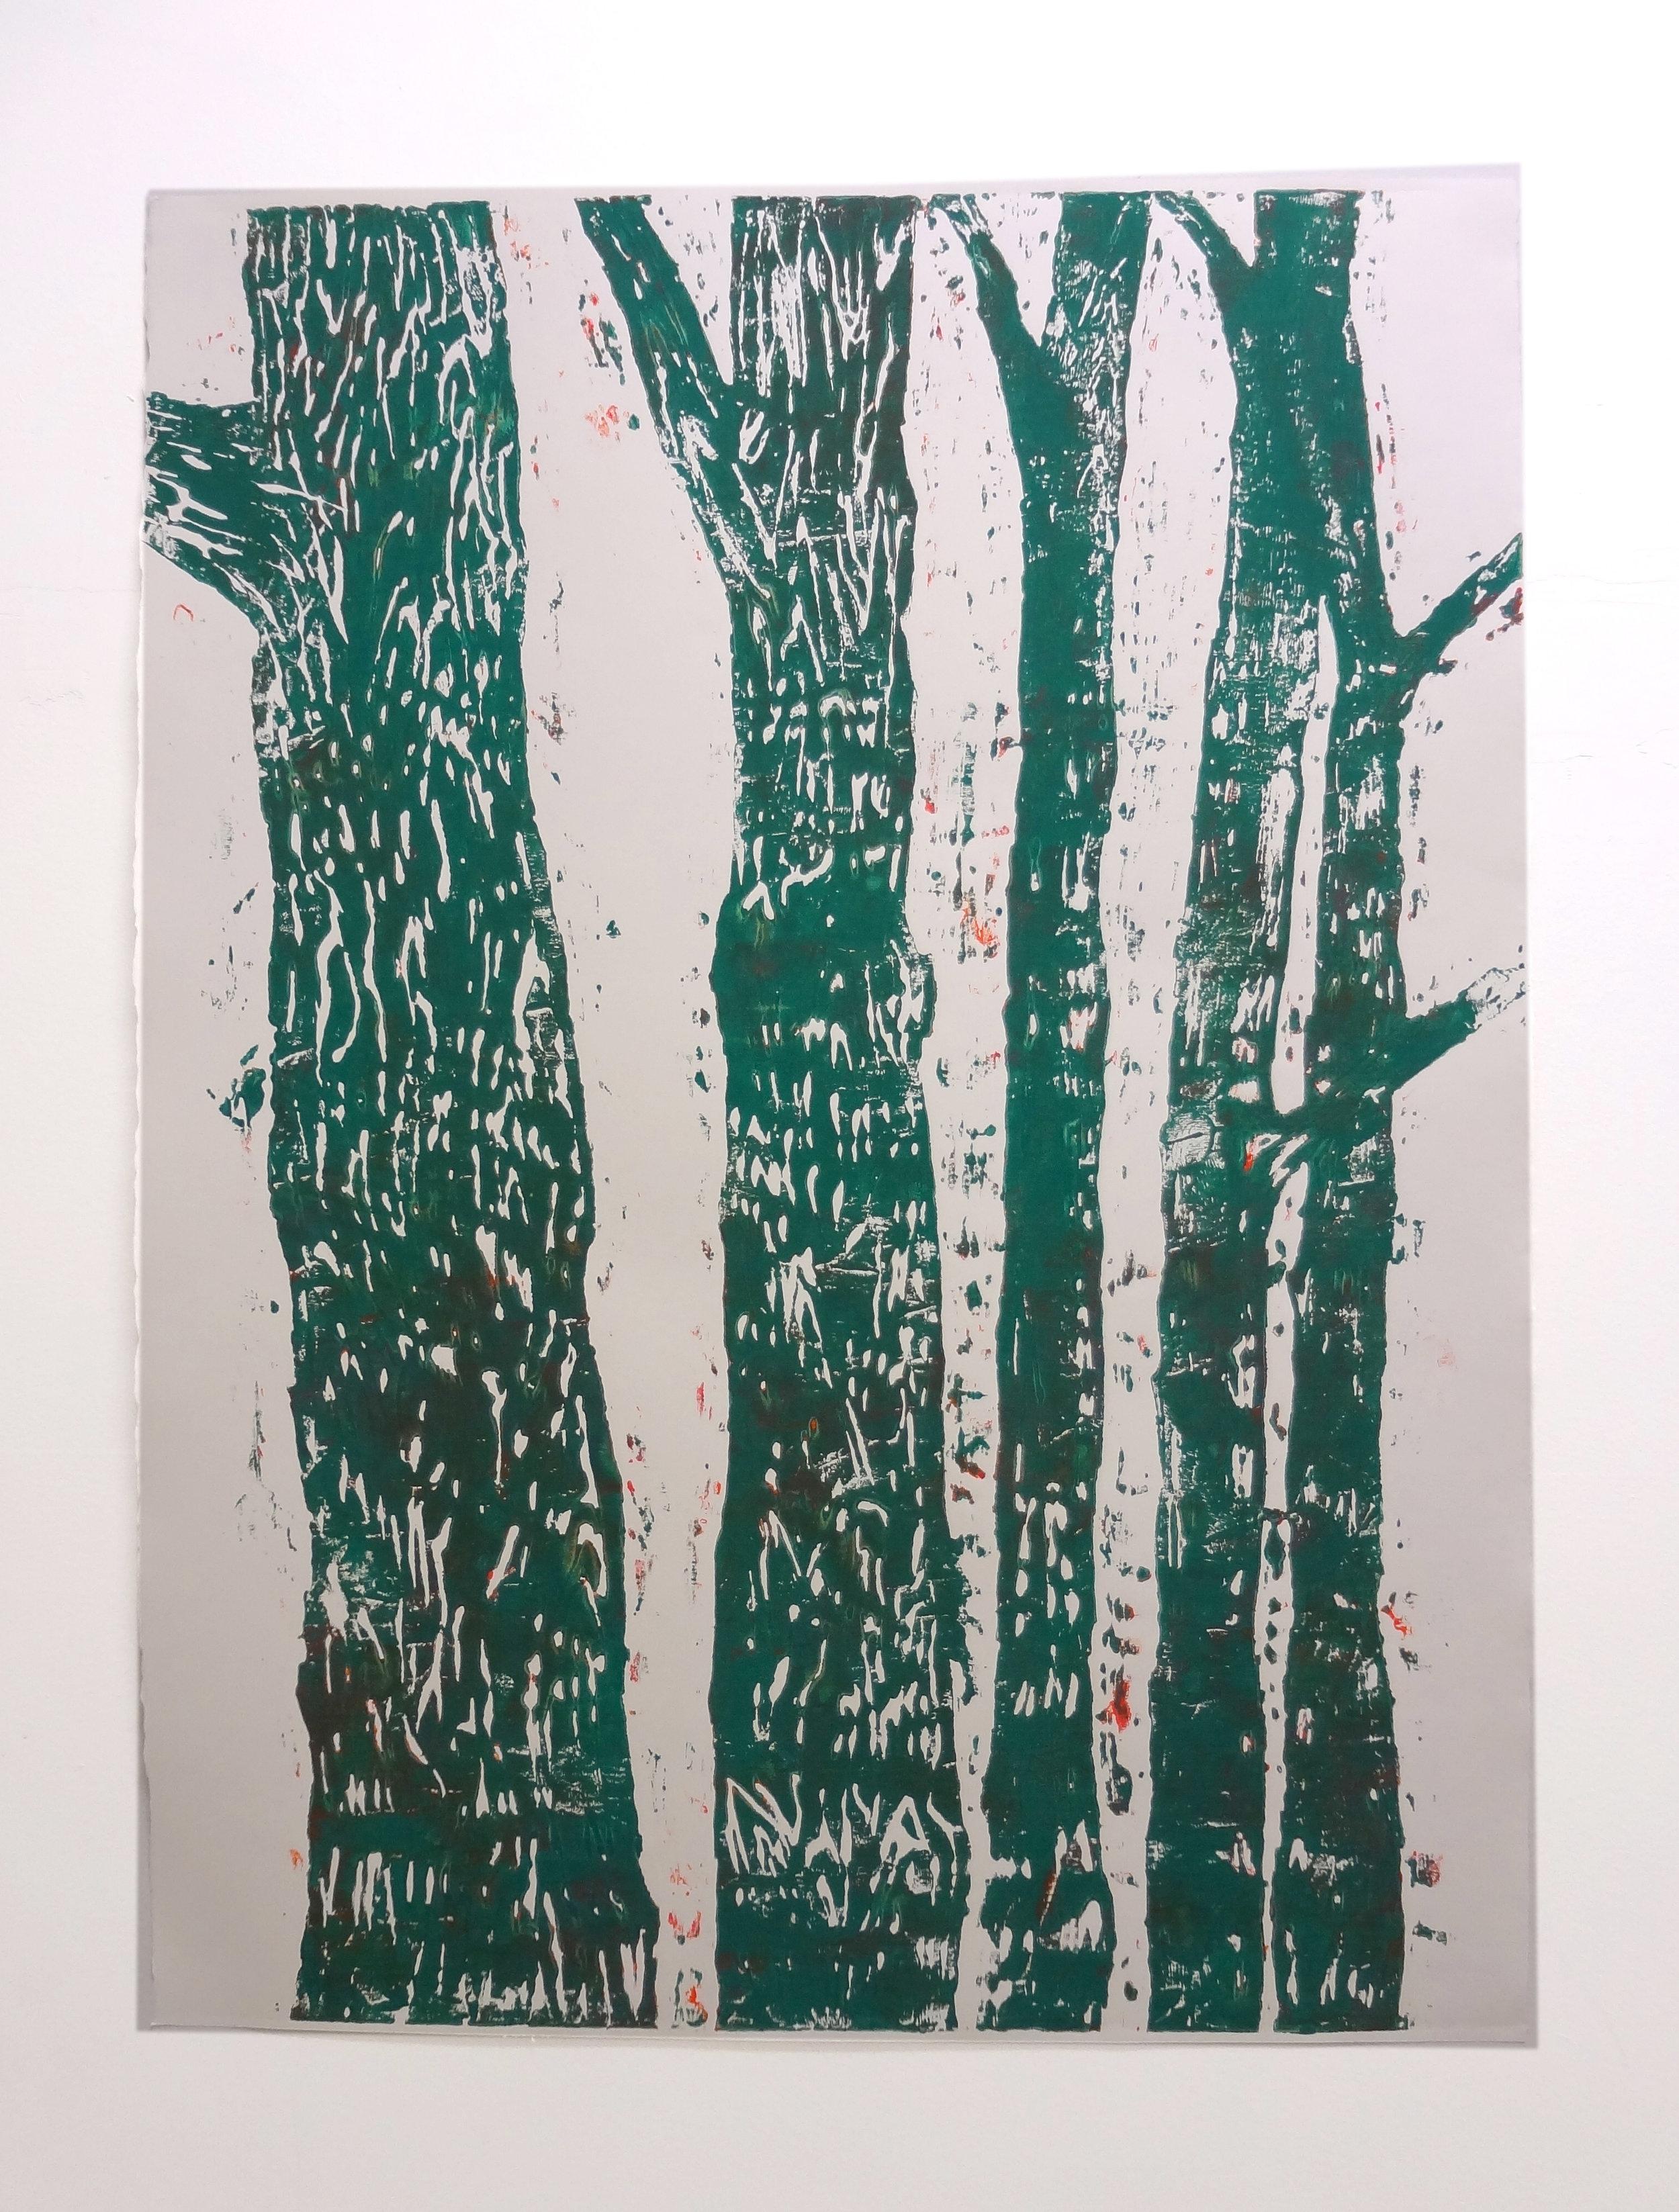 Meghan Gerety  Green Trees , 2012 blockprint ink on blockprint paper 40 x 30 in.  SOLD